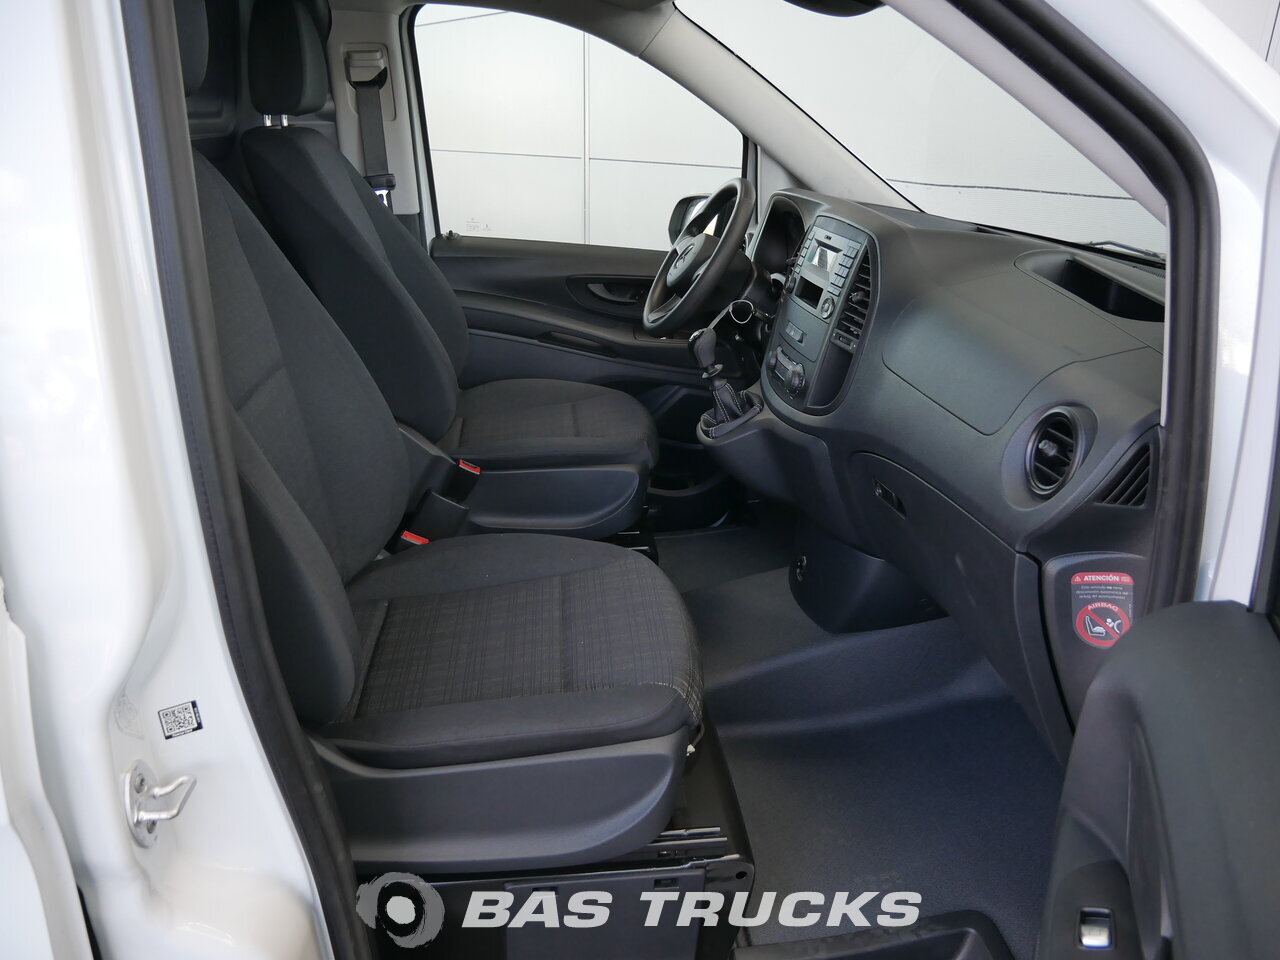 mercedes vito leichte nutzfahrzeuge euro 0 17900 bas vans. Black Bedroom Furniture Sets. Home Design Ideas